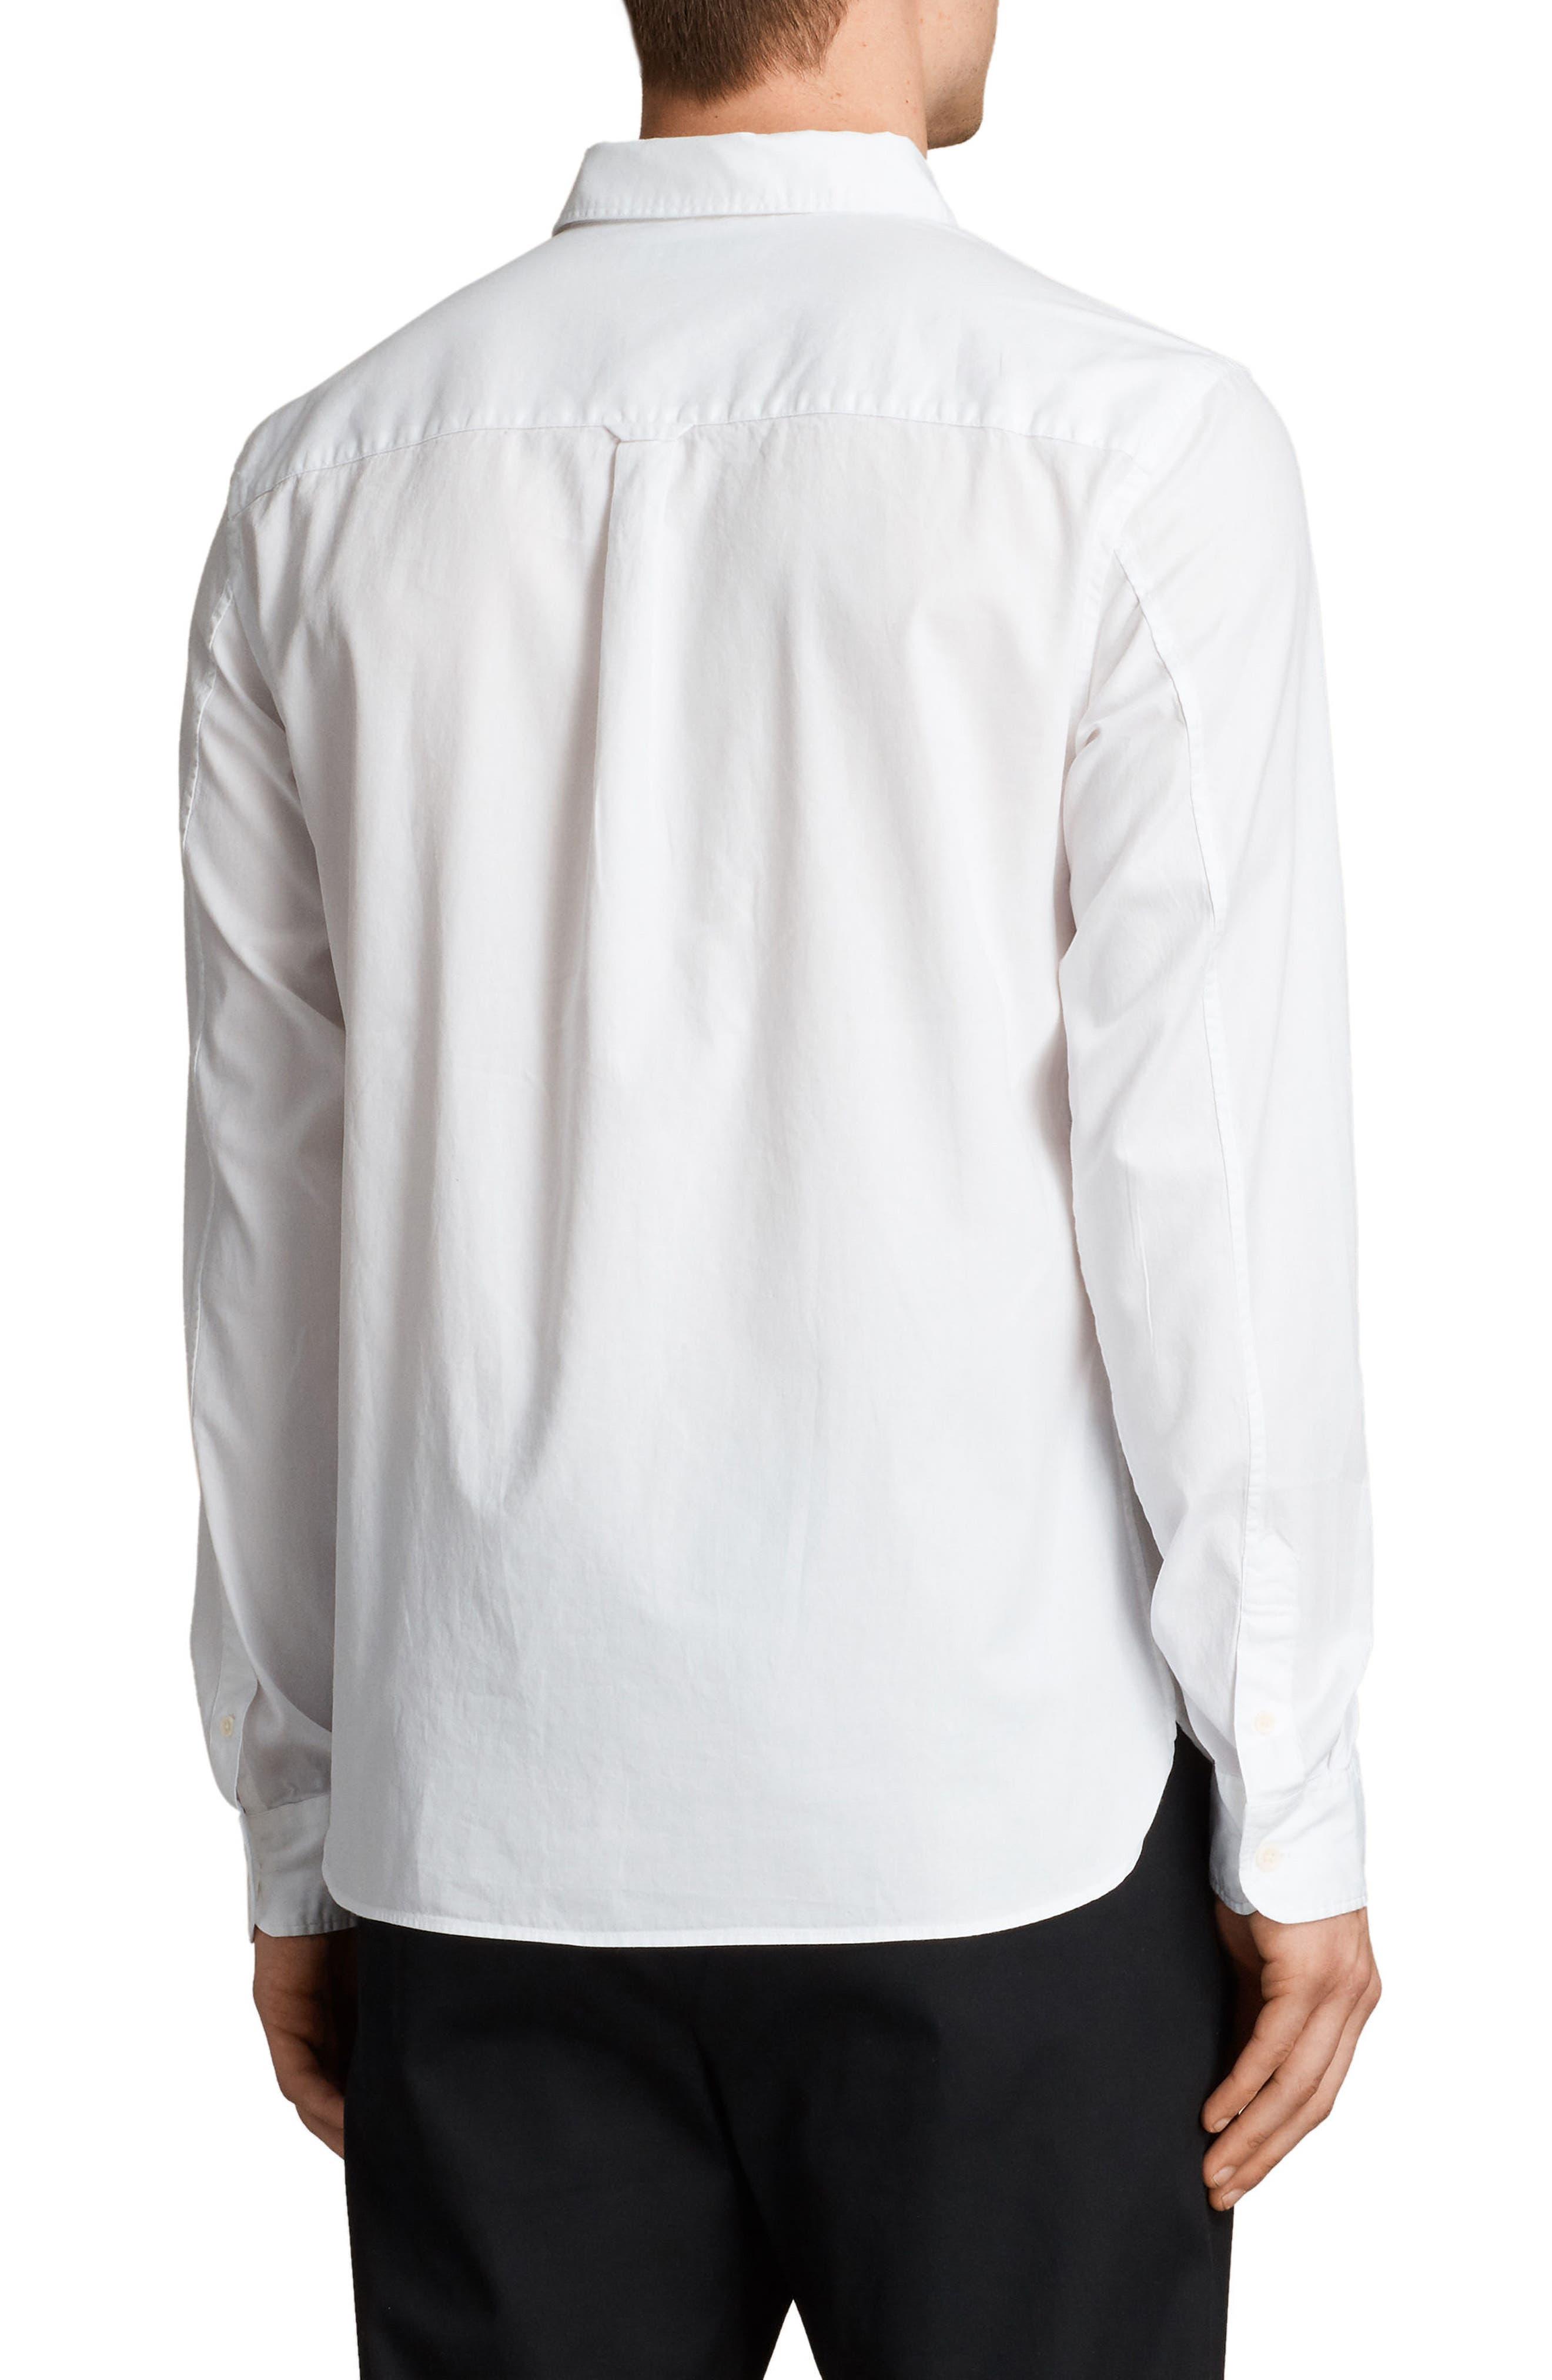 Redondo Slim Fit Shirt,                             Alternate thumbnail 3, color,                             White